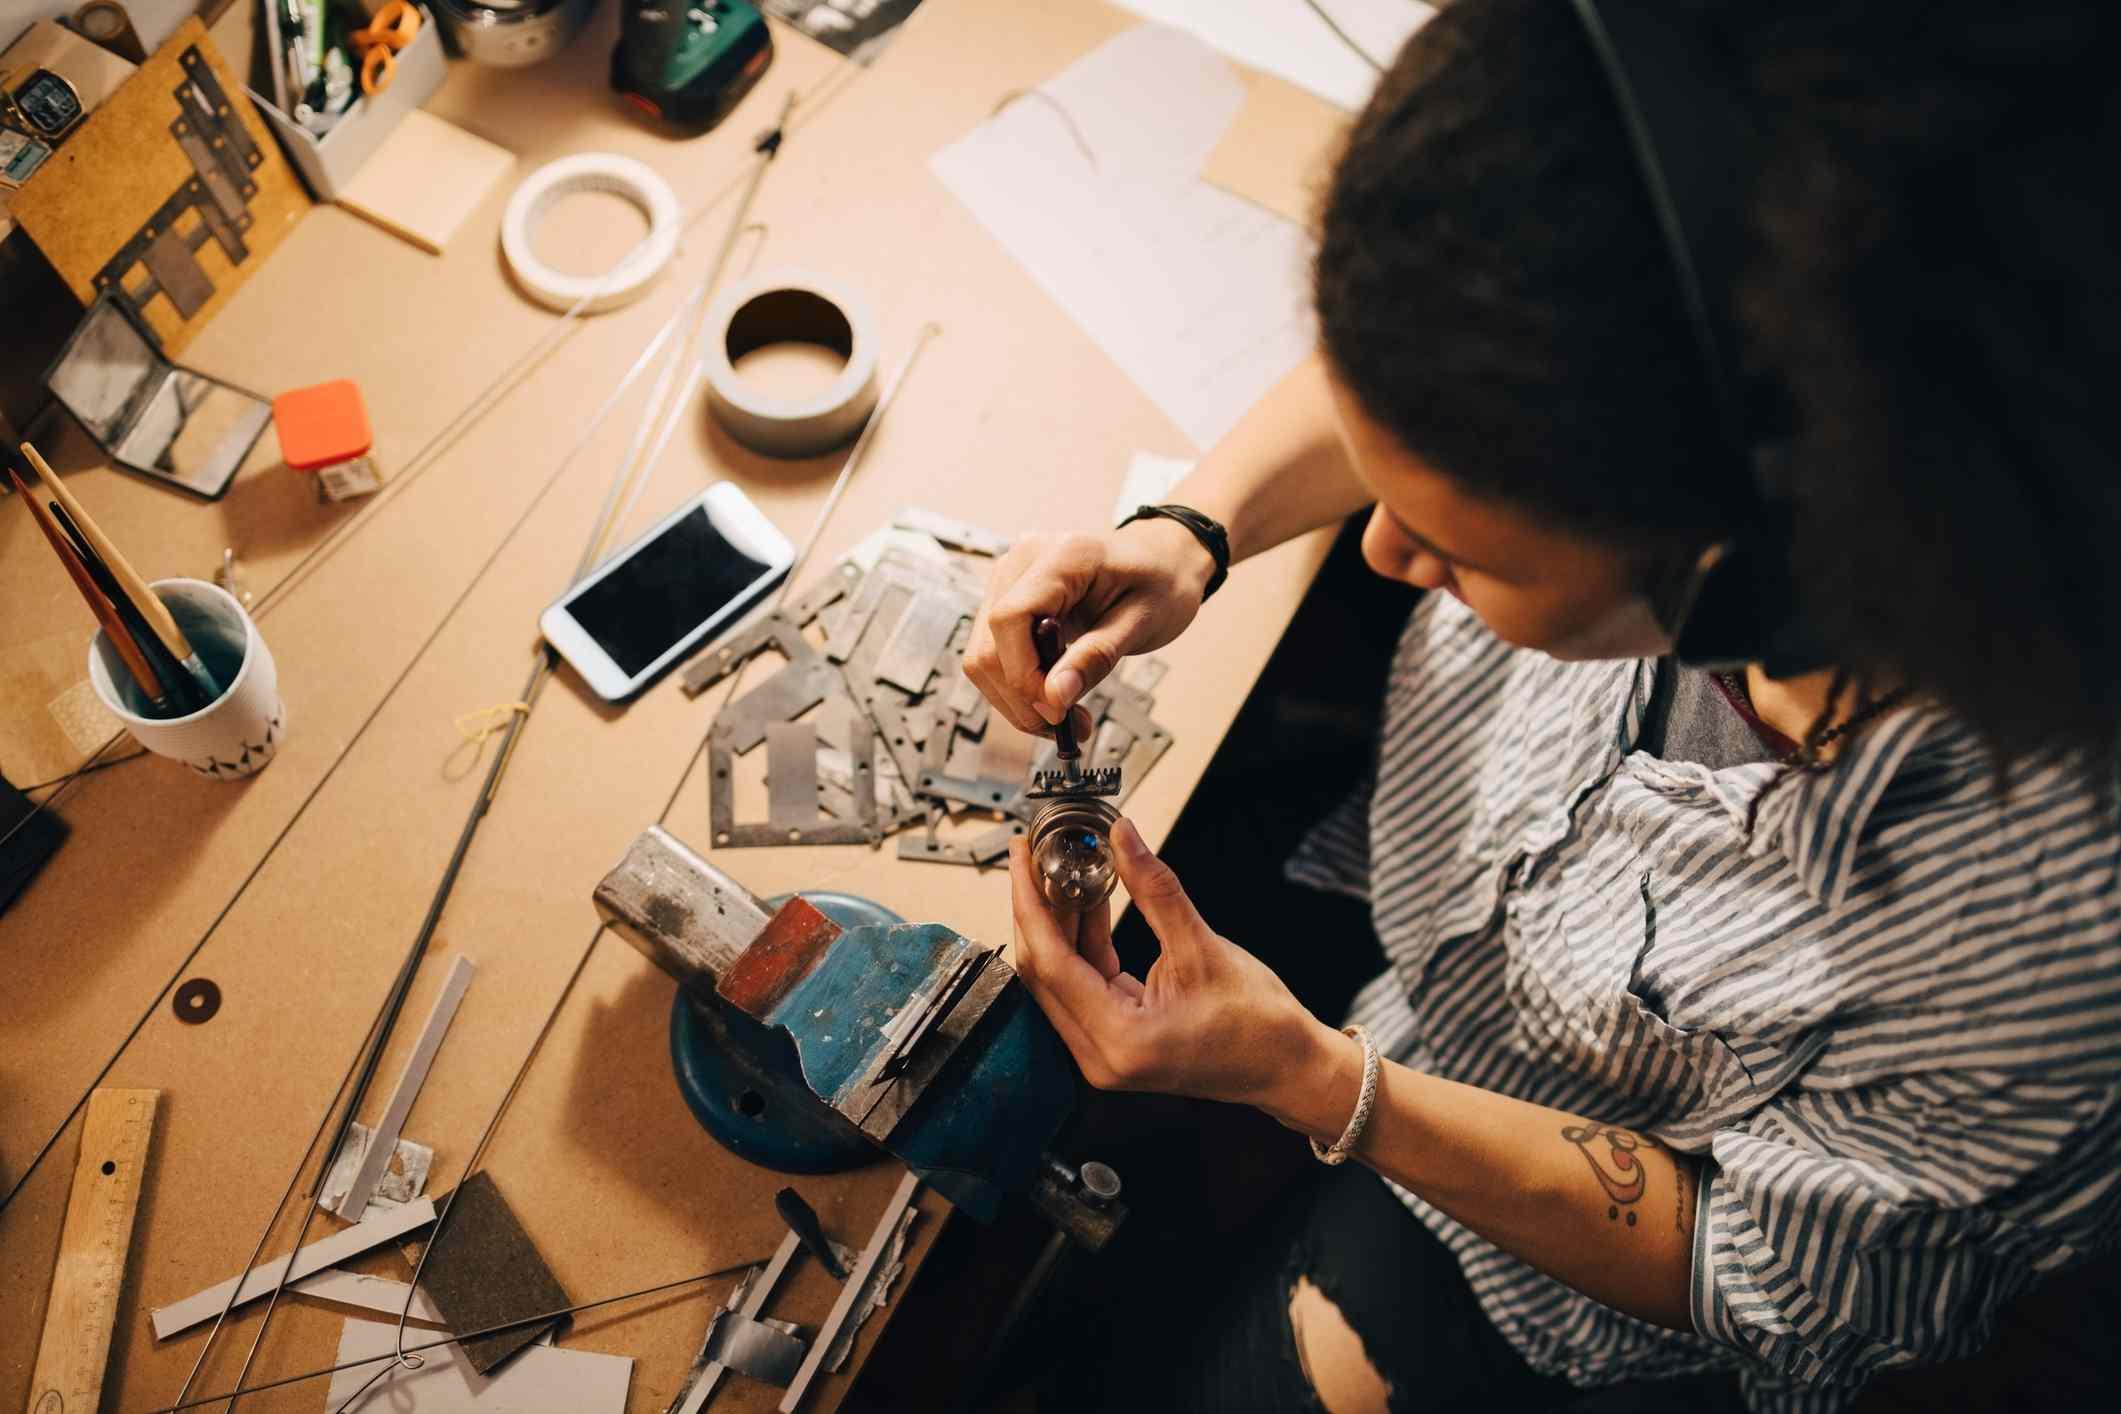 Technician repairing phone